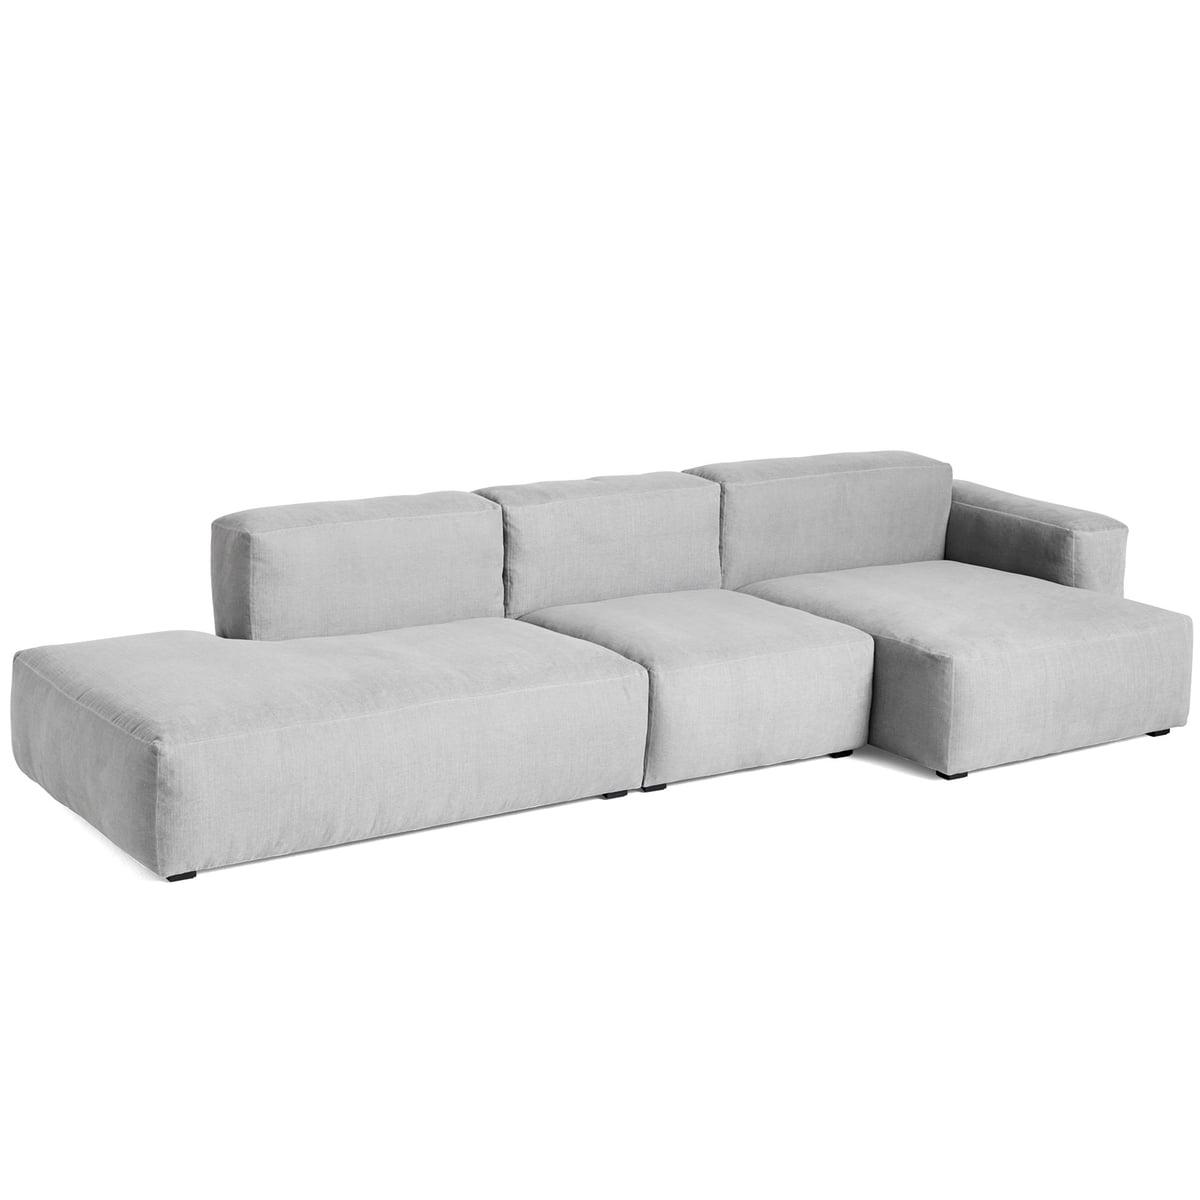 Hay mags soft sofa 3 sitzer  kombination 4 armlehne niedrig rechts hellgrau linara 443 frei